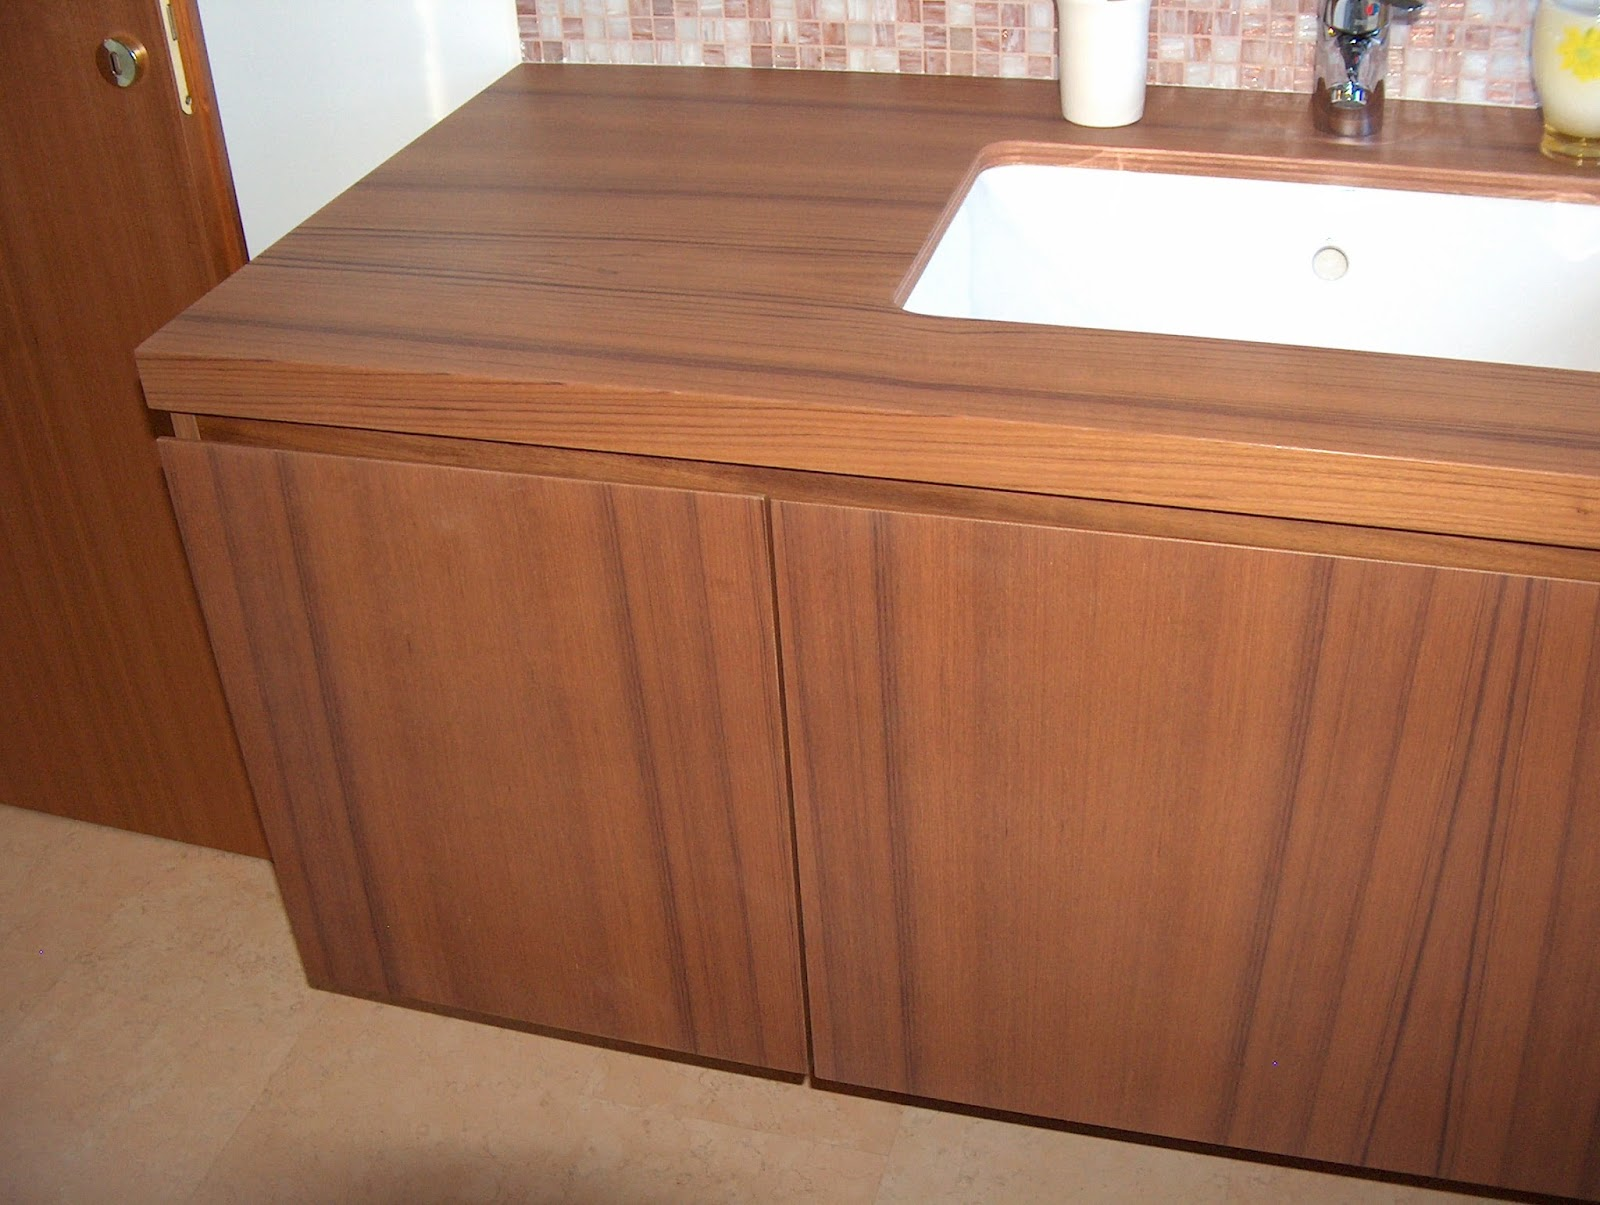 Arredamento su misura mobili bagno moderni su misura - Top bagno su misura ...